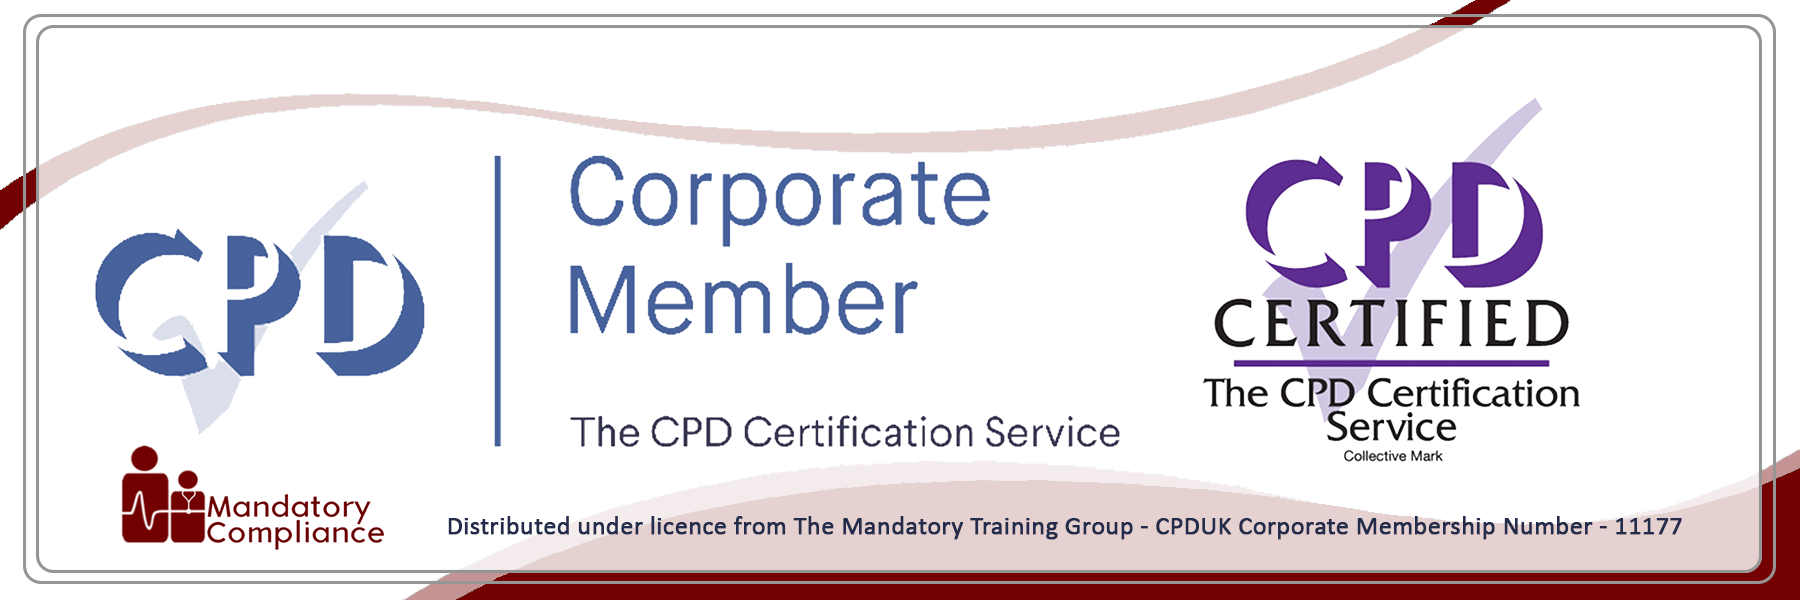 Report Writing - Enhanced Dental CPD Course - Mandatory Compliance UK -